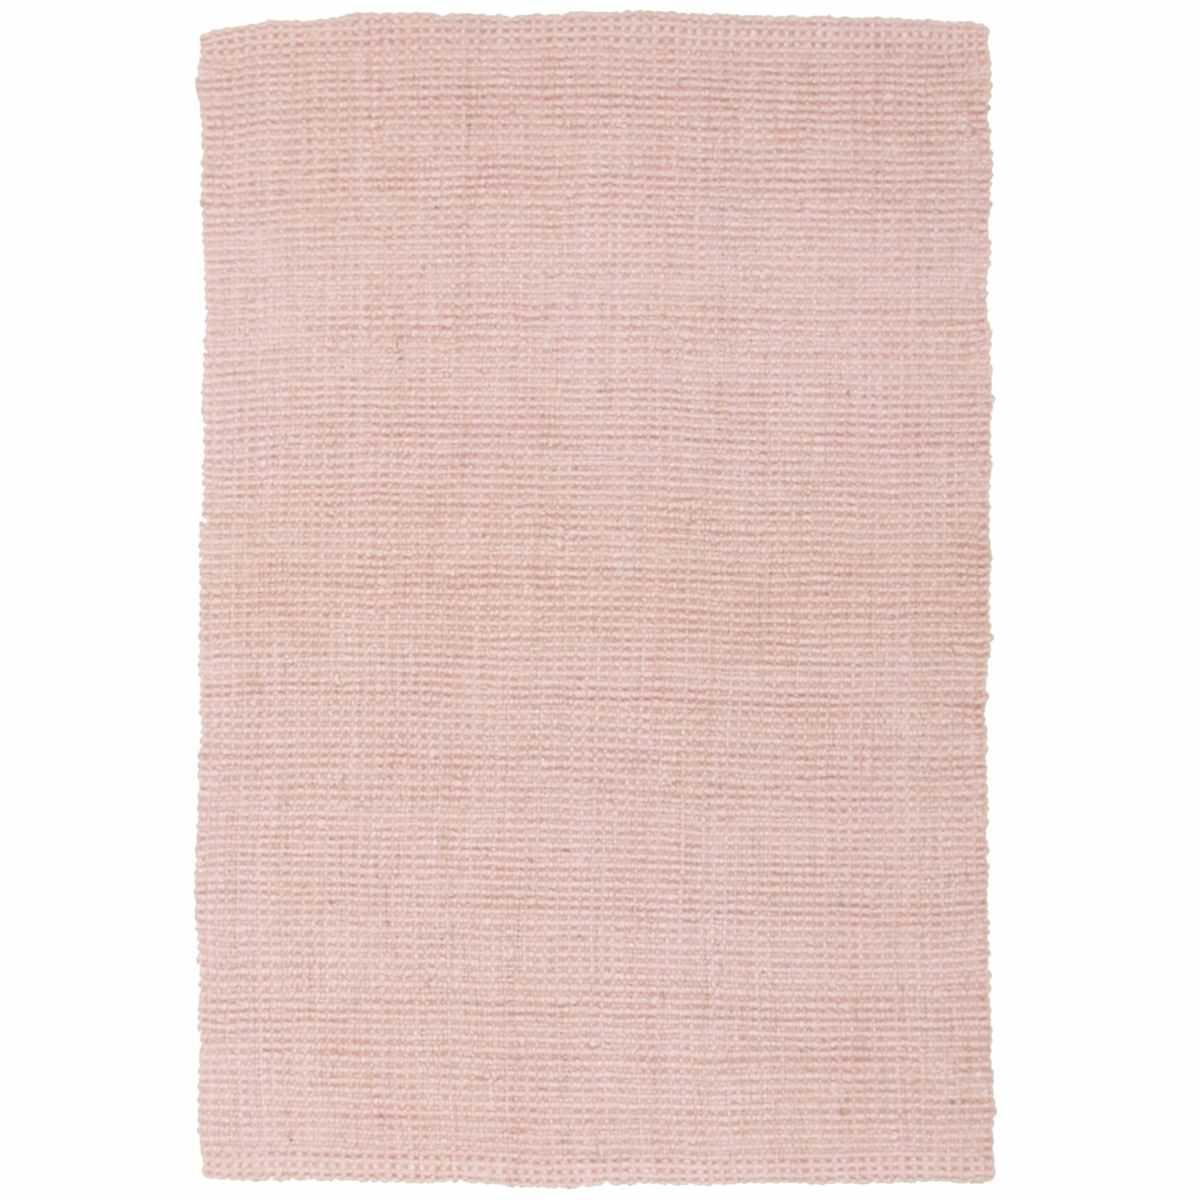 Atrium Barker Jute Rug, 220x150cm, Pink